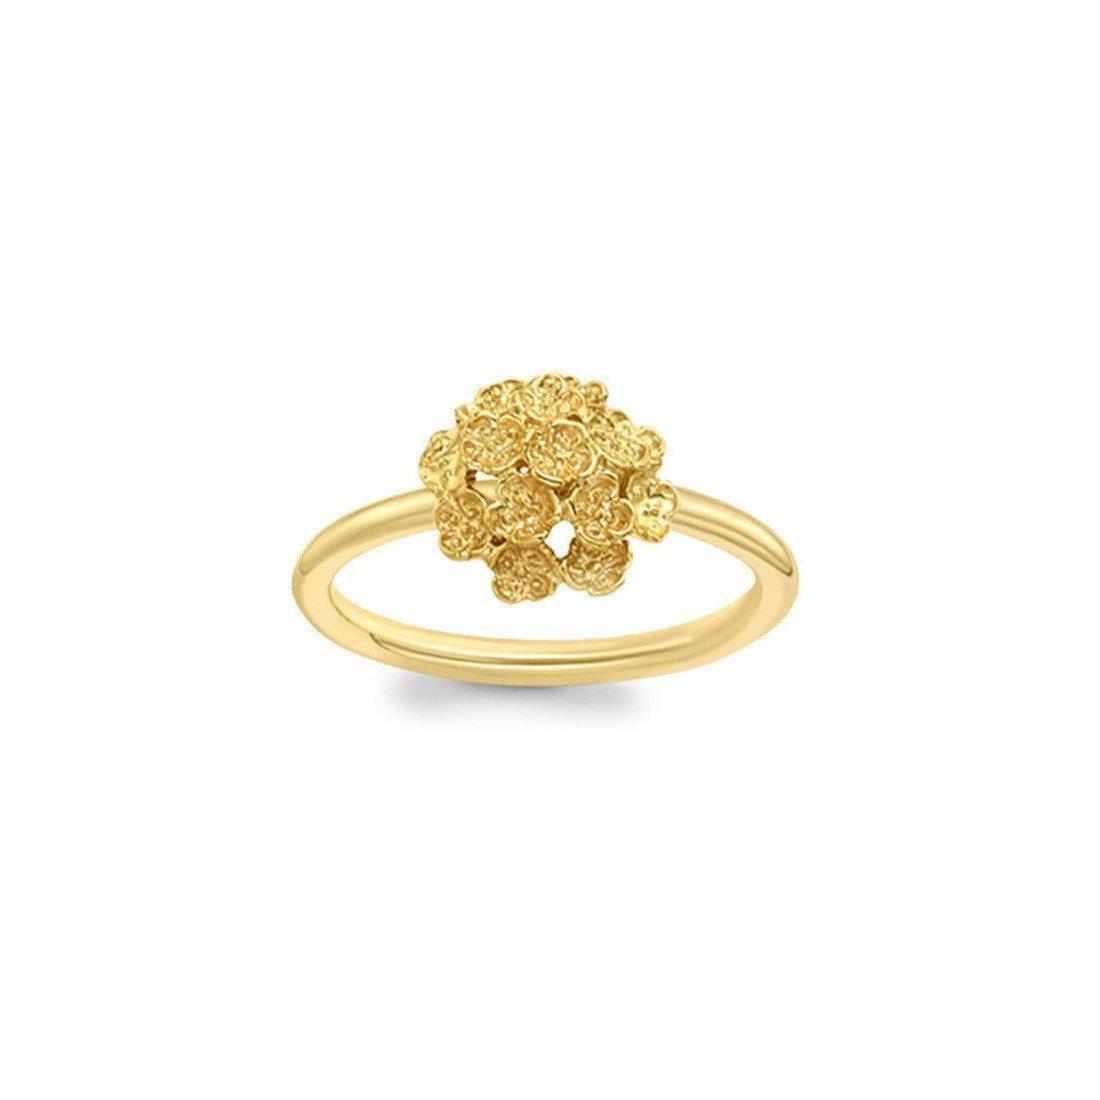 London Road Jewellery Kew Yellow Gold Posy Cluster Ring WEfOkEnh